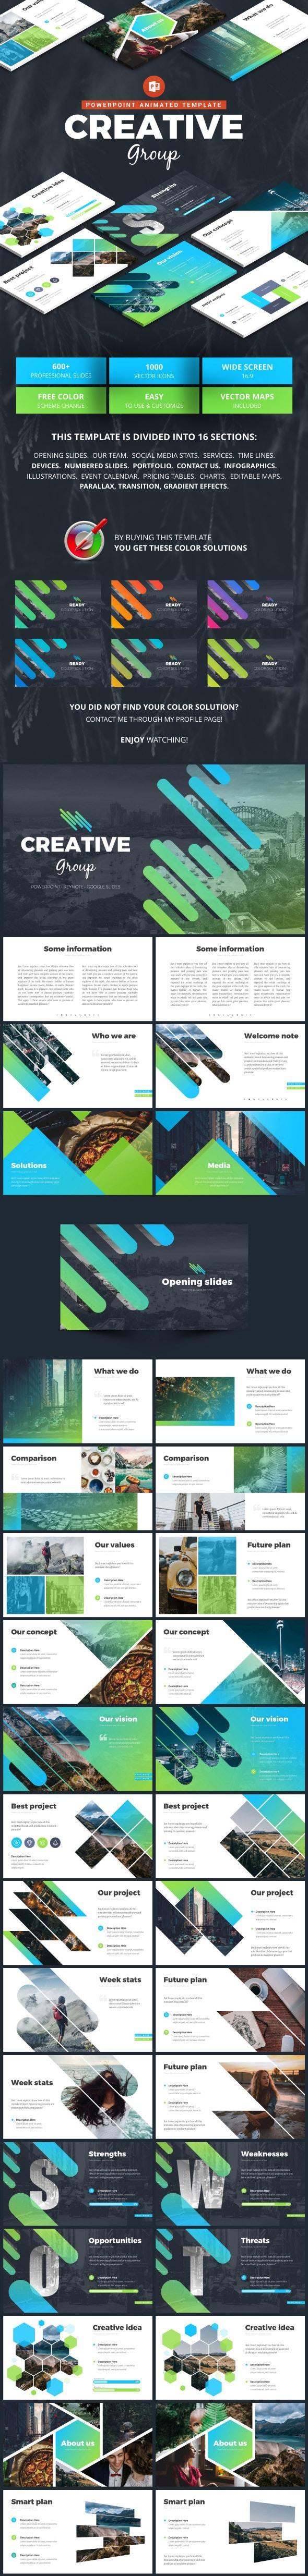 Modern Creative Marketing - Pitch Deck PowerPoint Templates